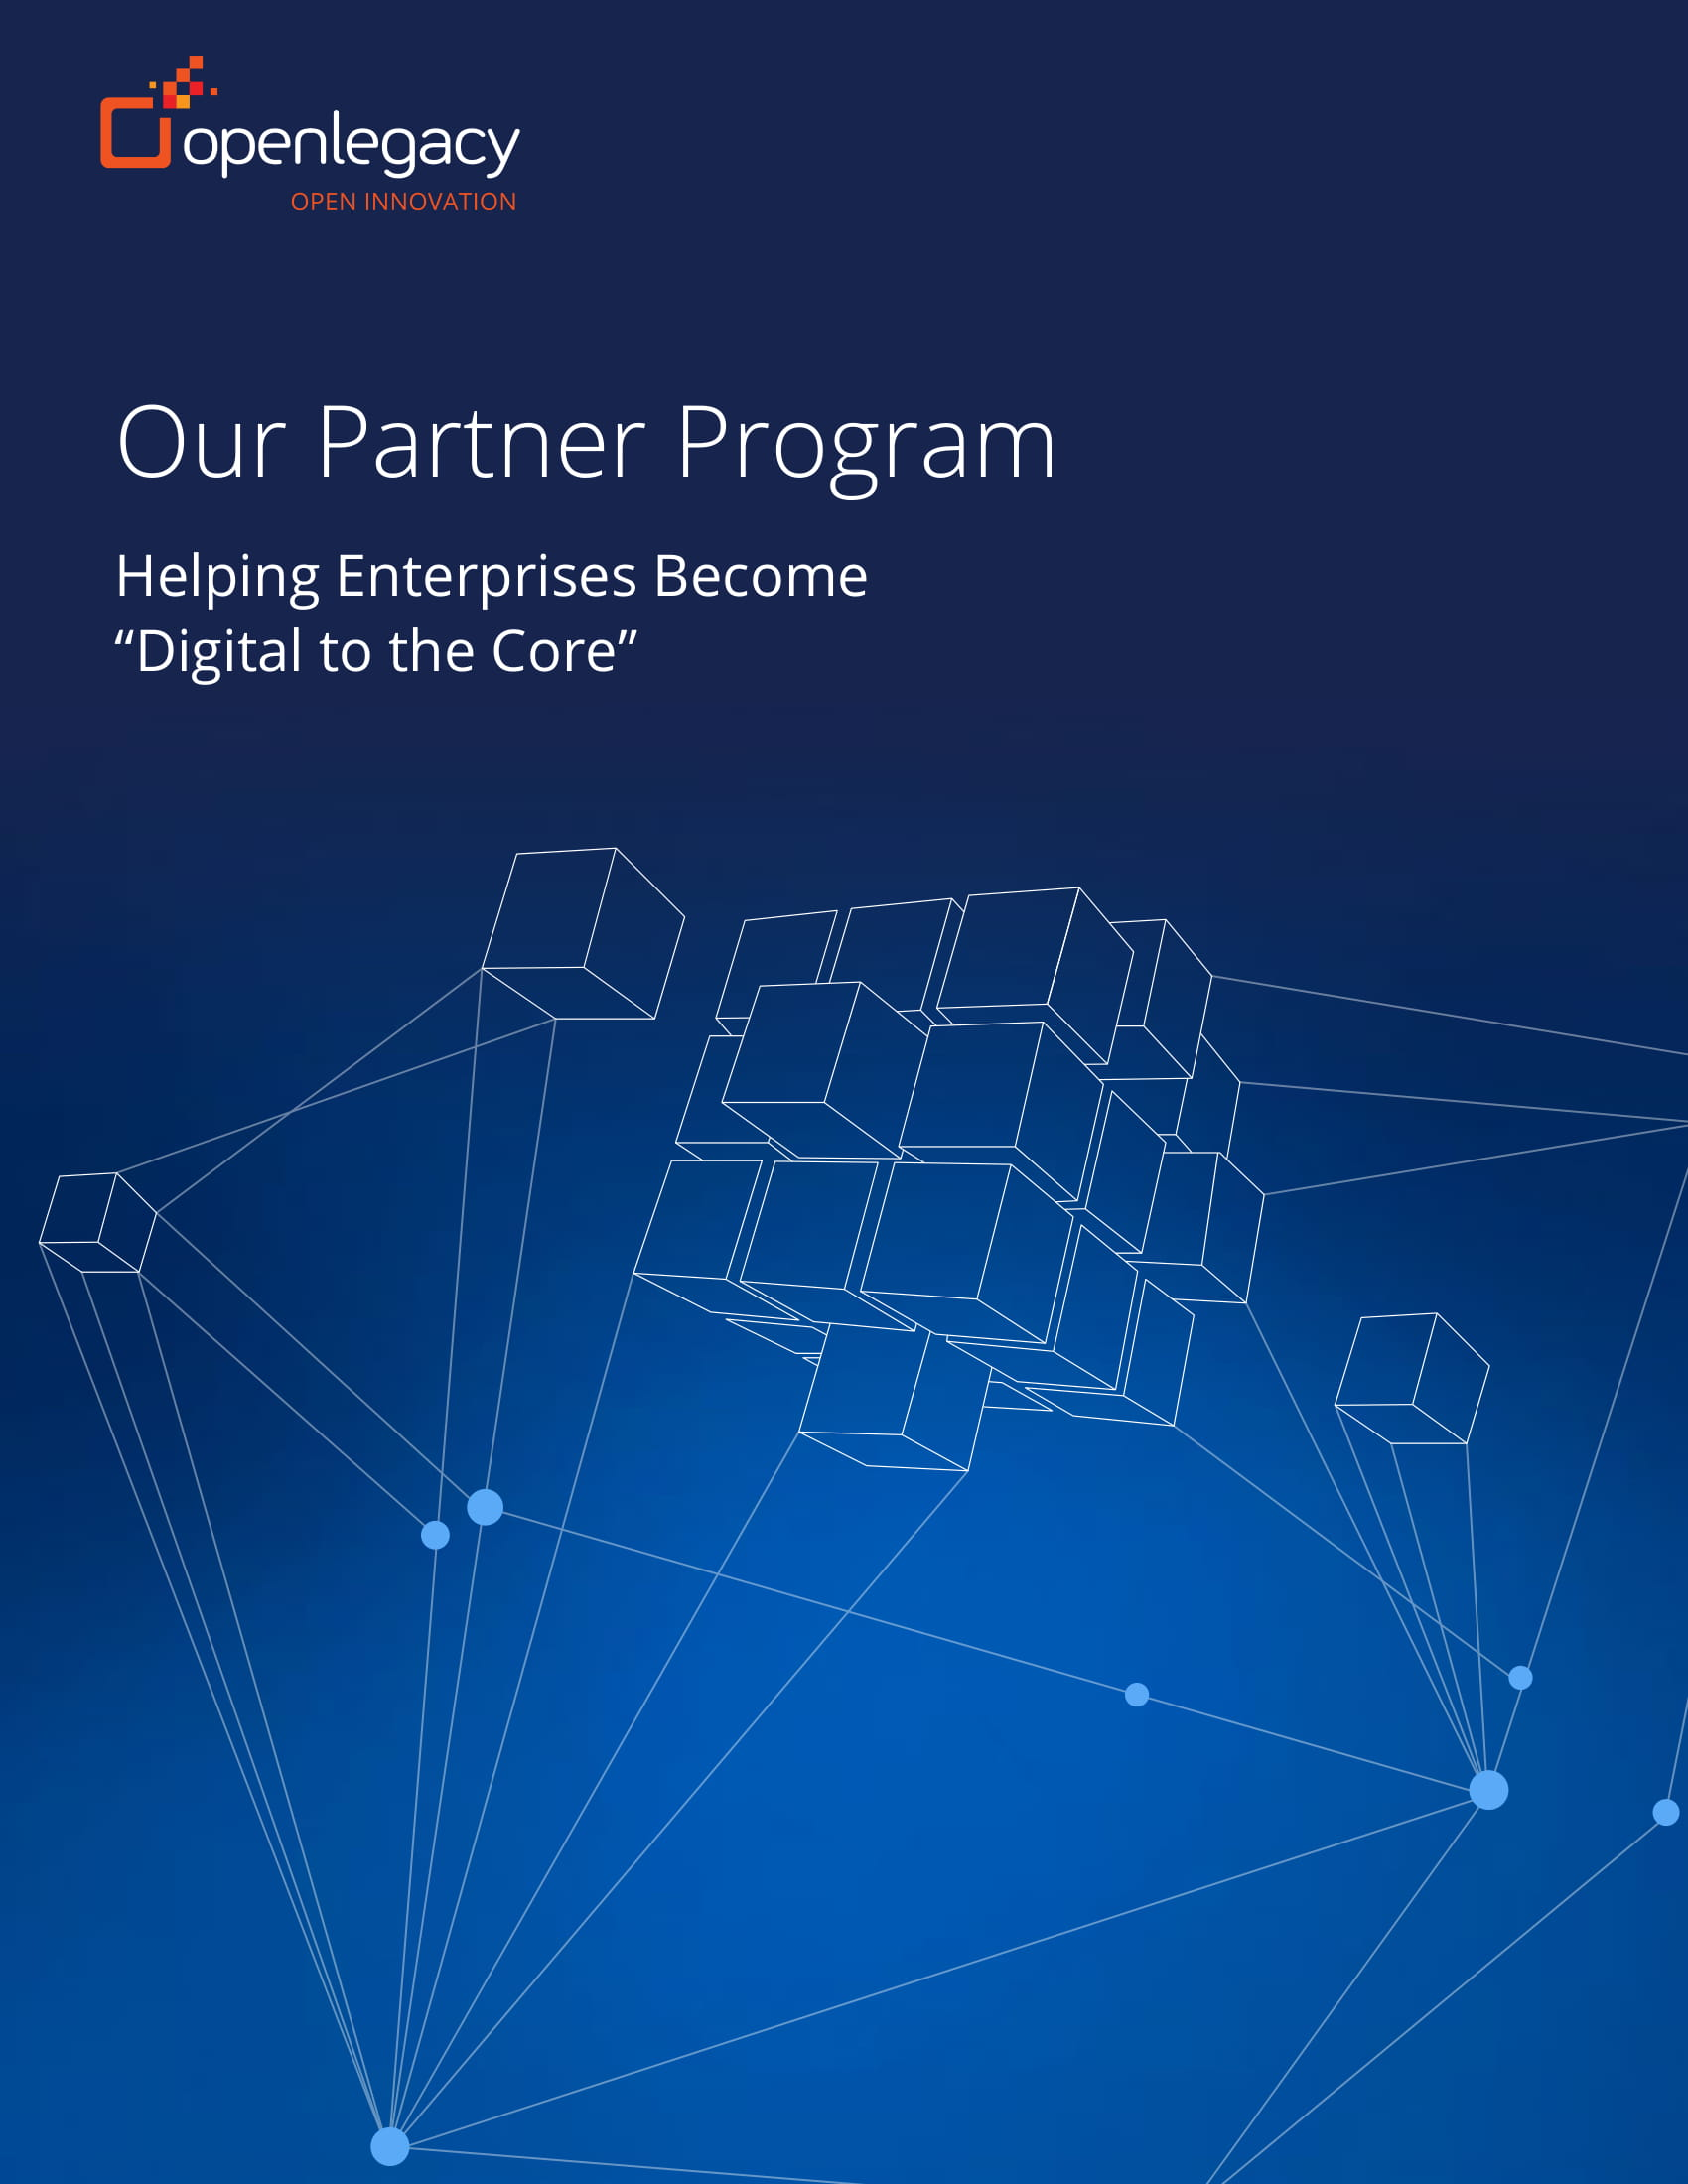 Download the Partner Program Brochure